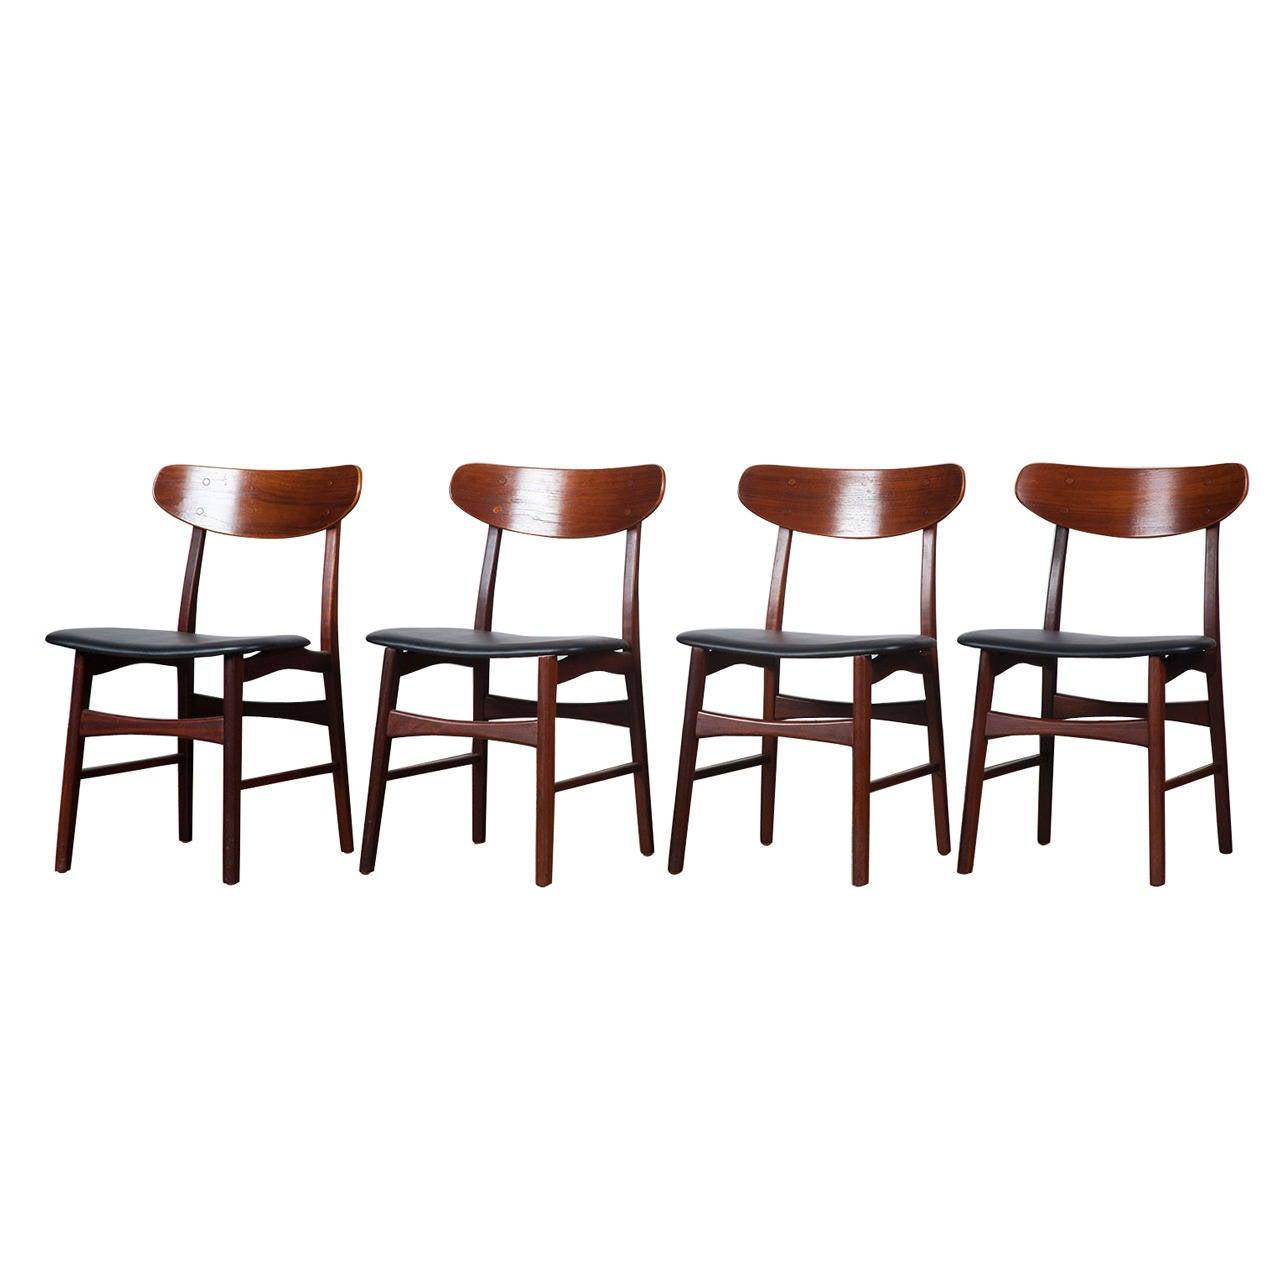 Set Of Four 20th Century Danish Teak Dining Chairs At 1stdibs